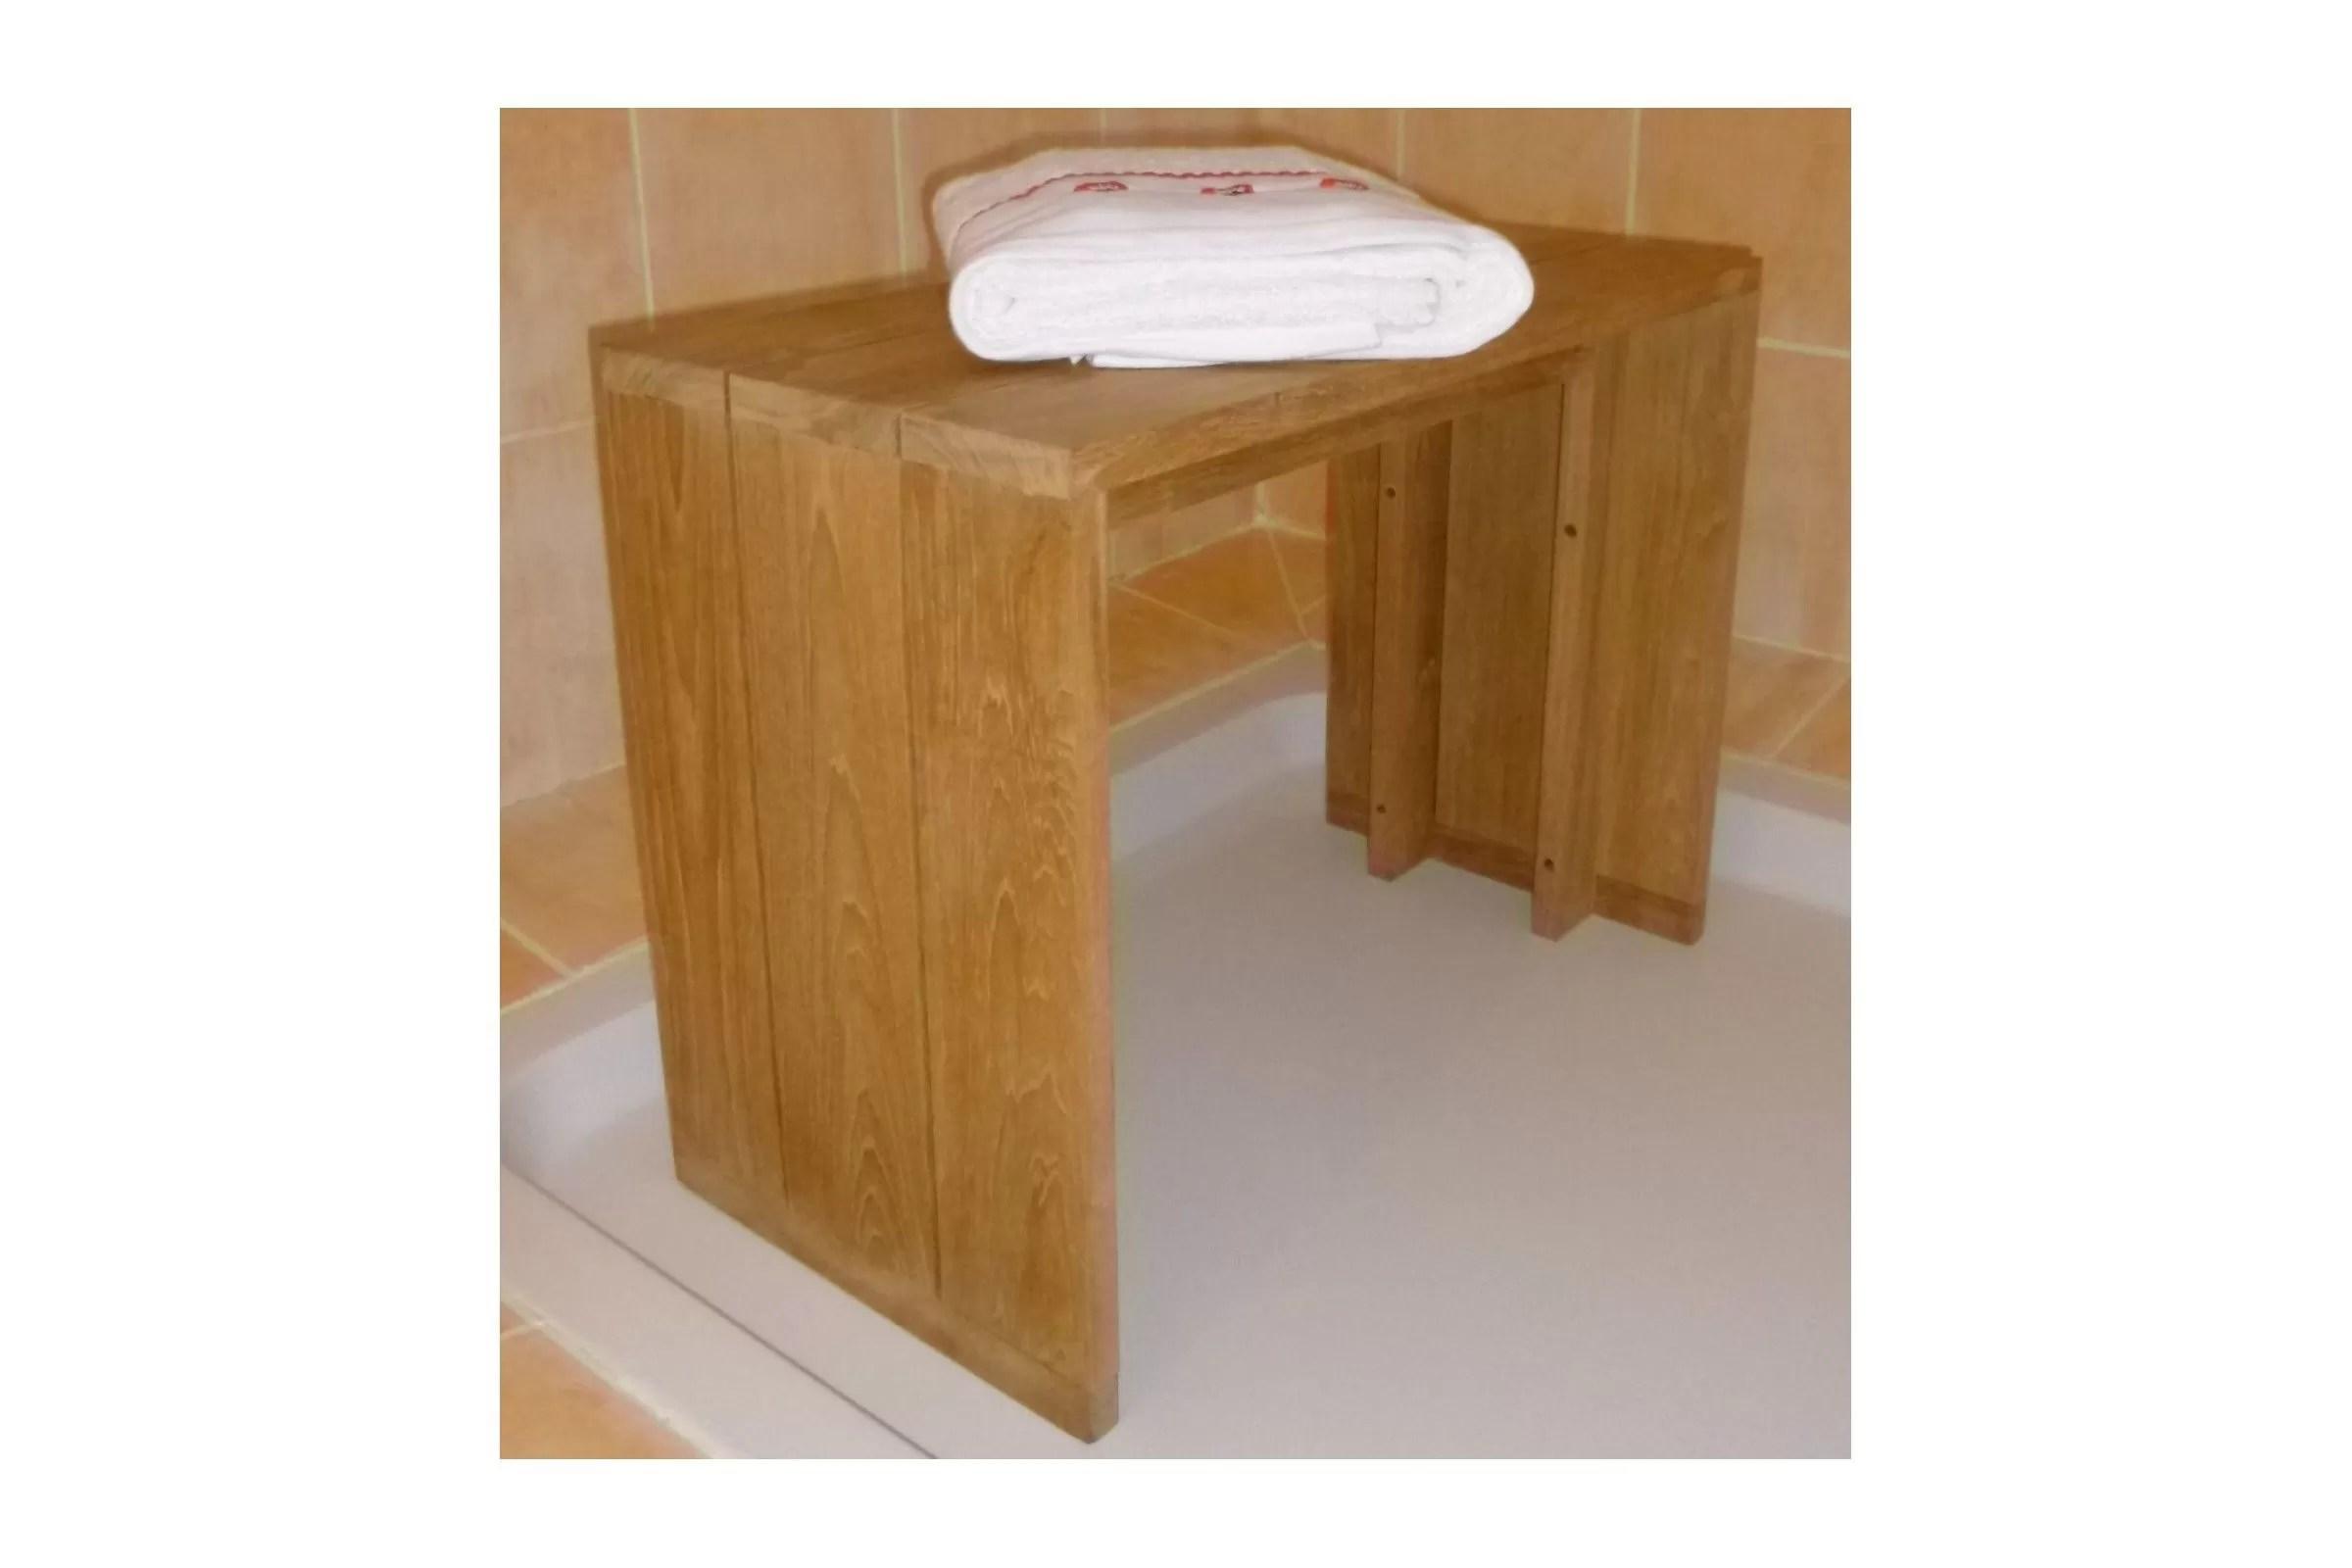 petit banc salle de bain cheap small wooden bench for bedroom kitchen or living room petit banc. Black Bedroom Furniture Sets. Home Design Ideas